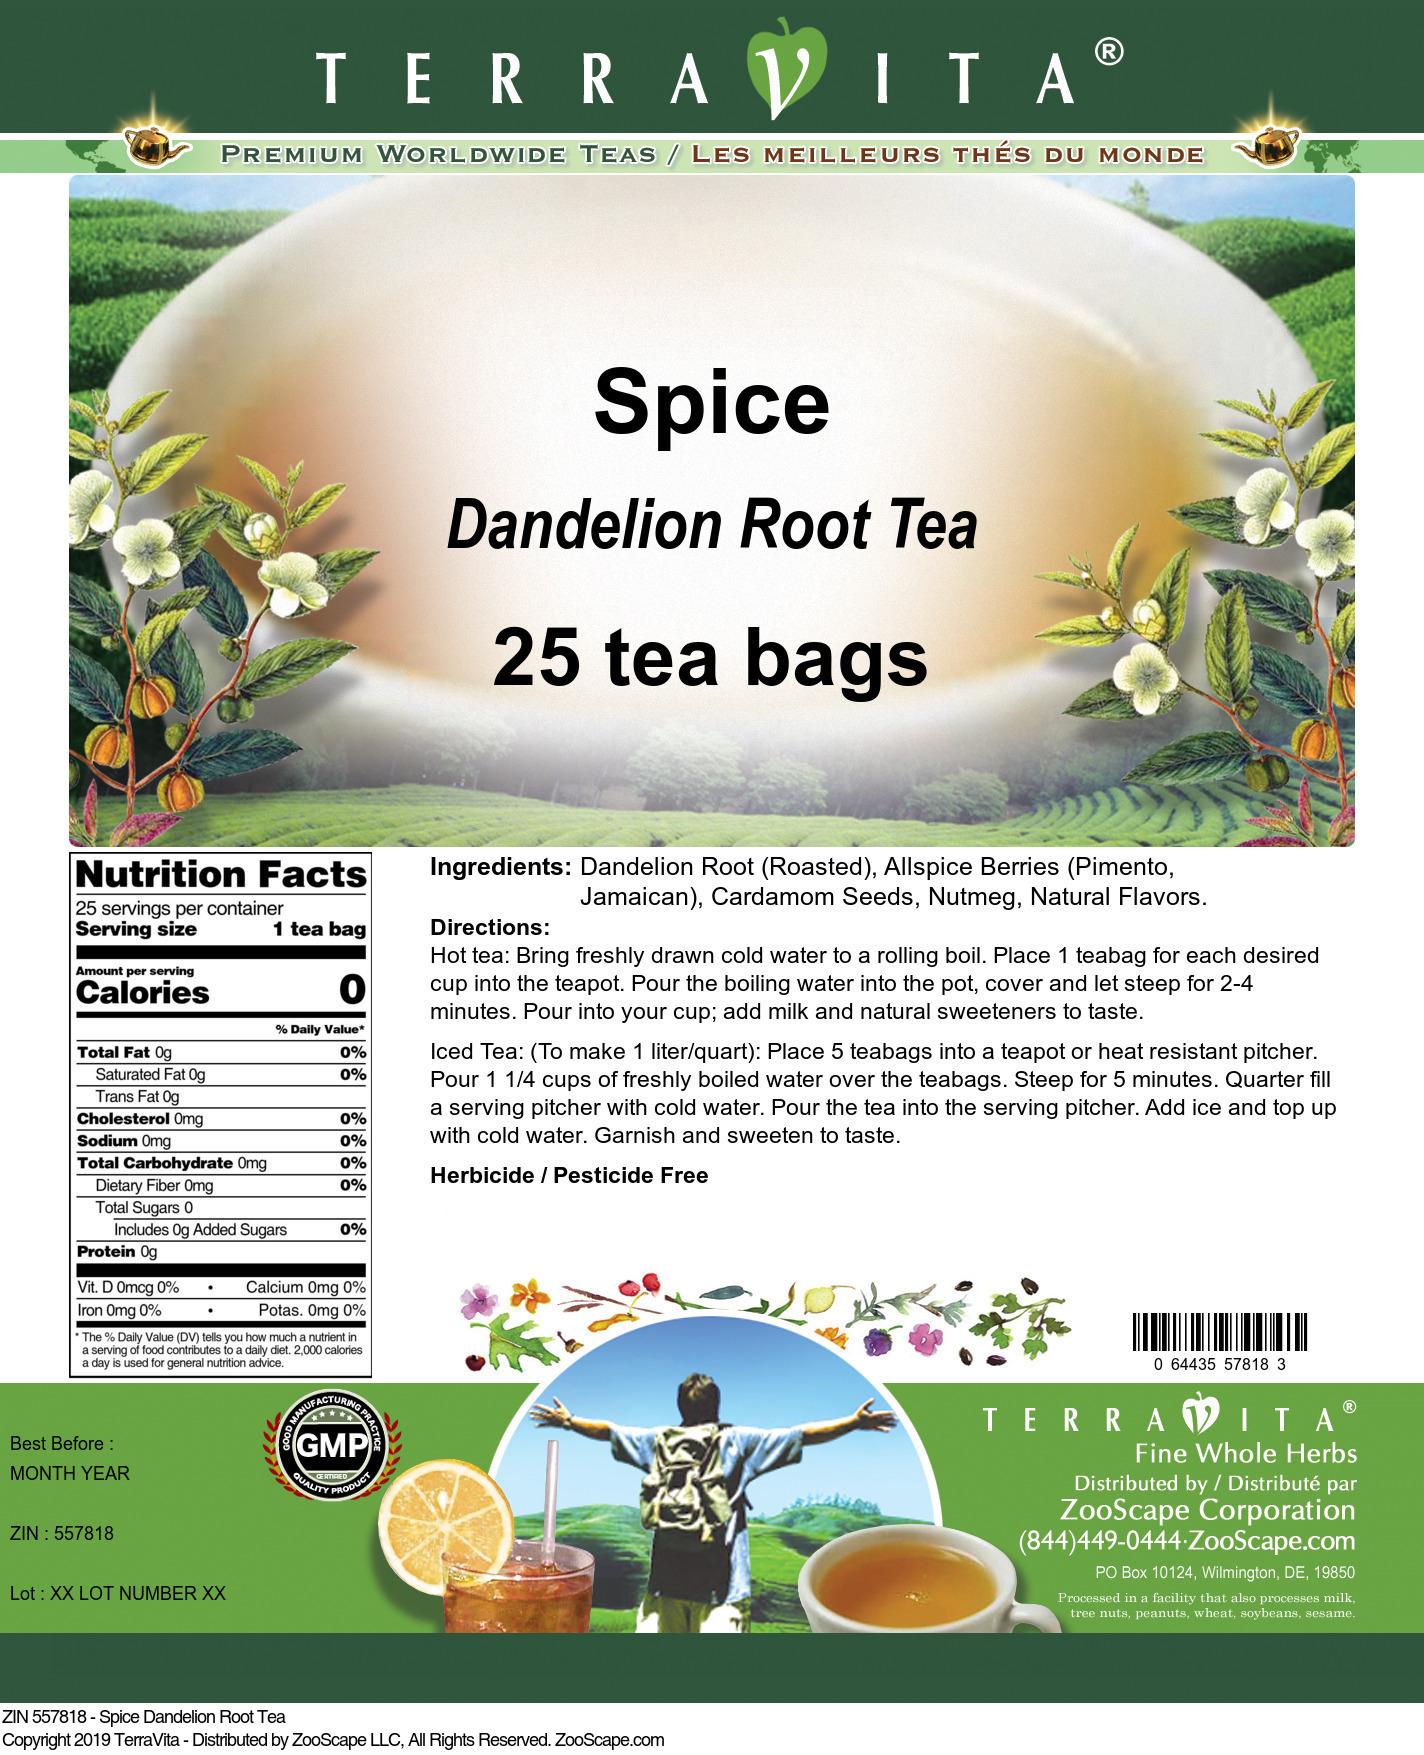 Spice Dandelion Root